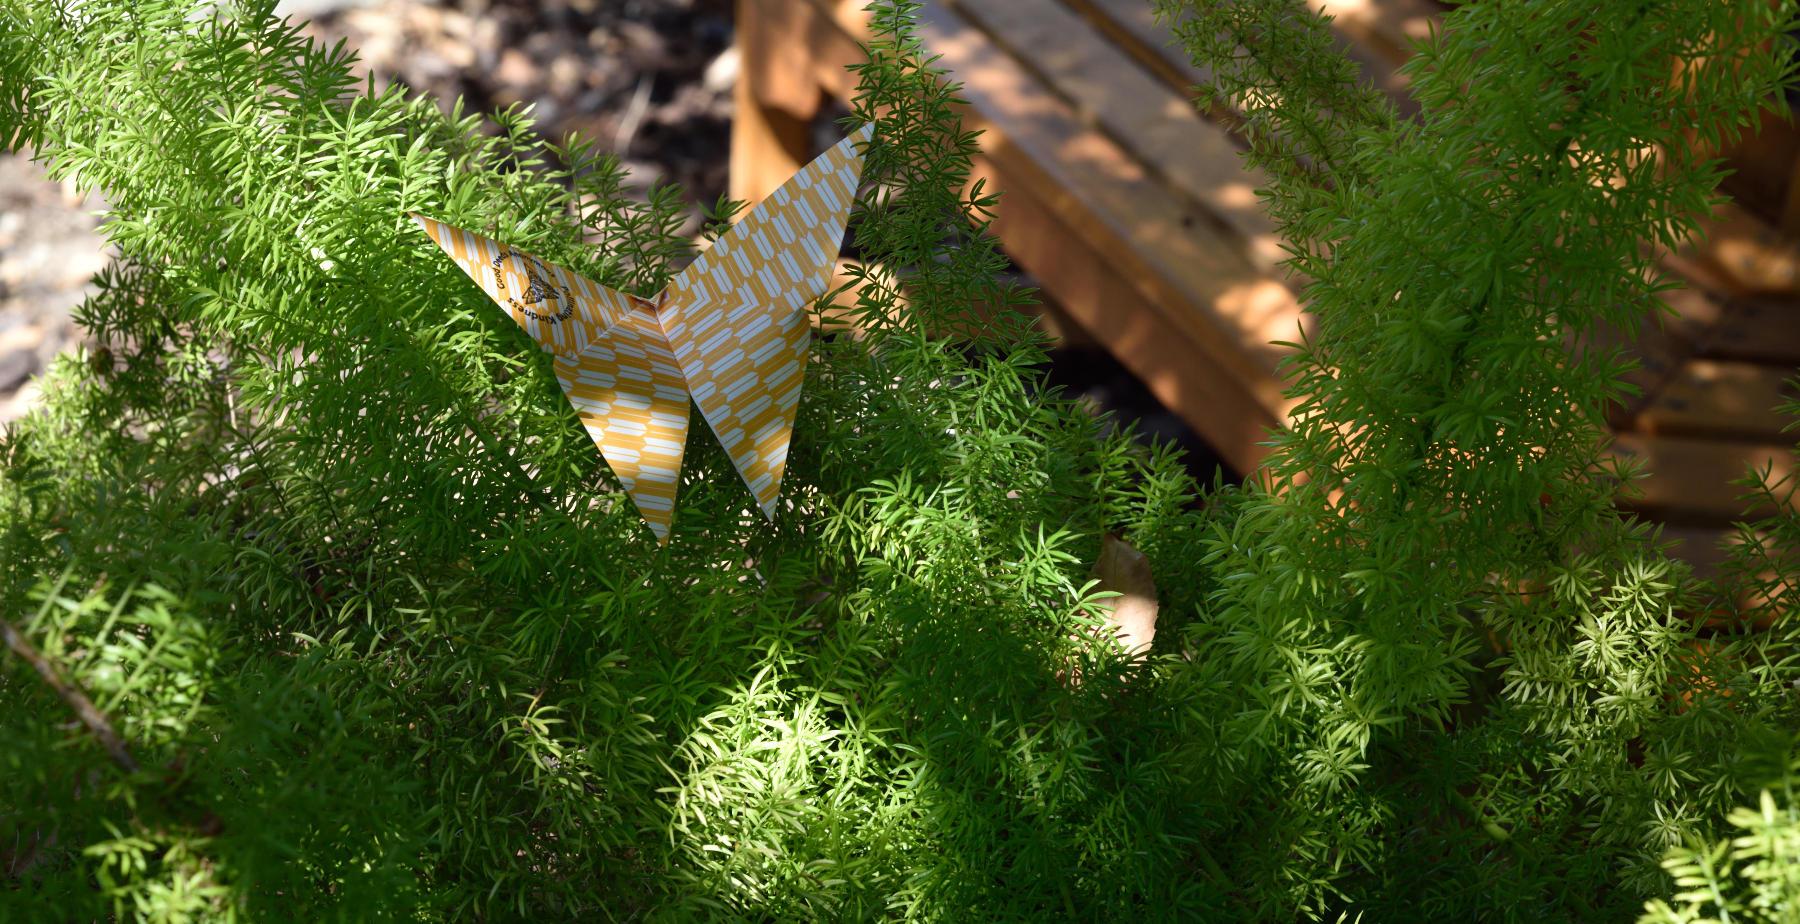 pollianting-kindness-yellowgreen-sm.jpg